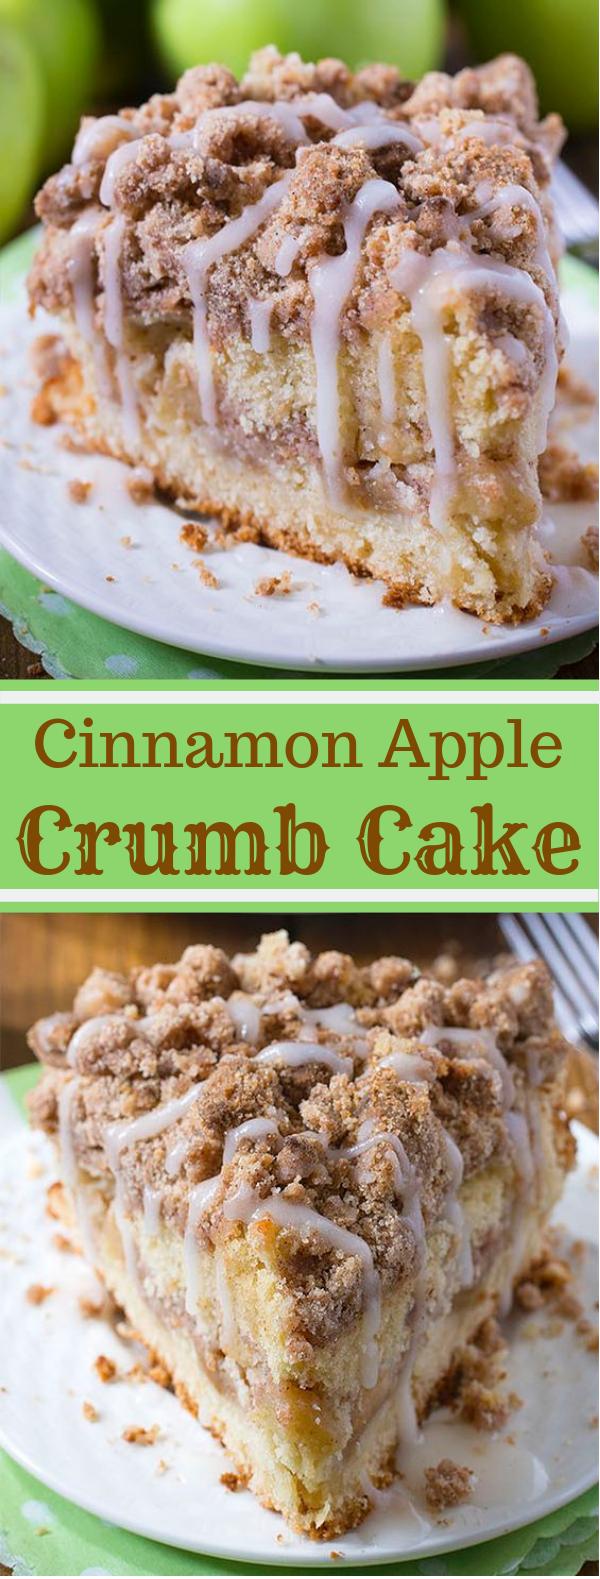 Cinnamon Apple Crumb Cake #Cake #Dessert